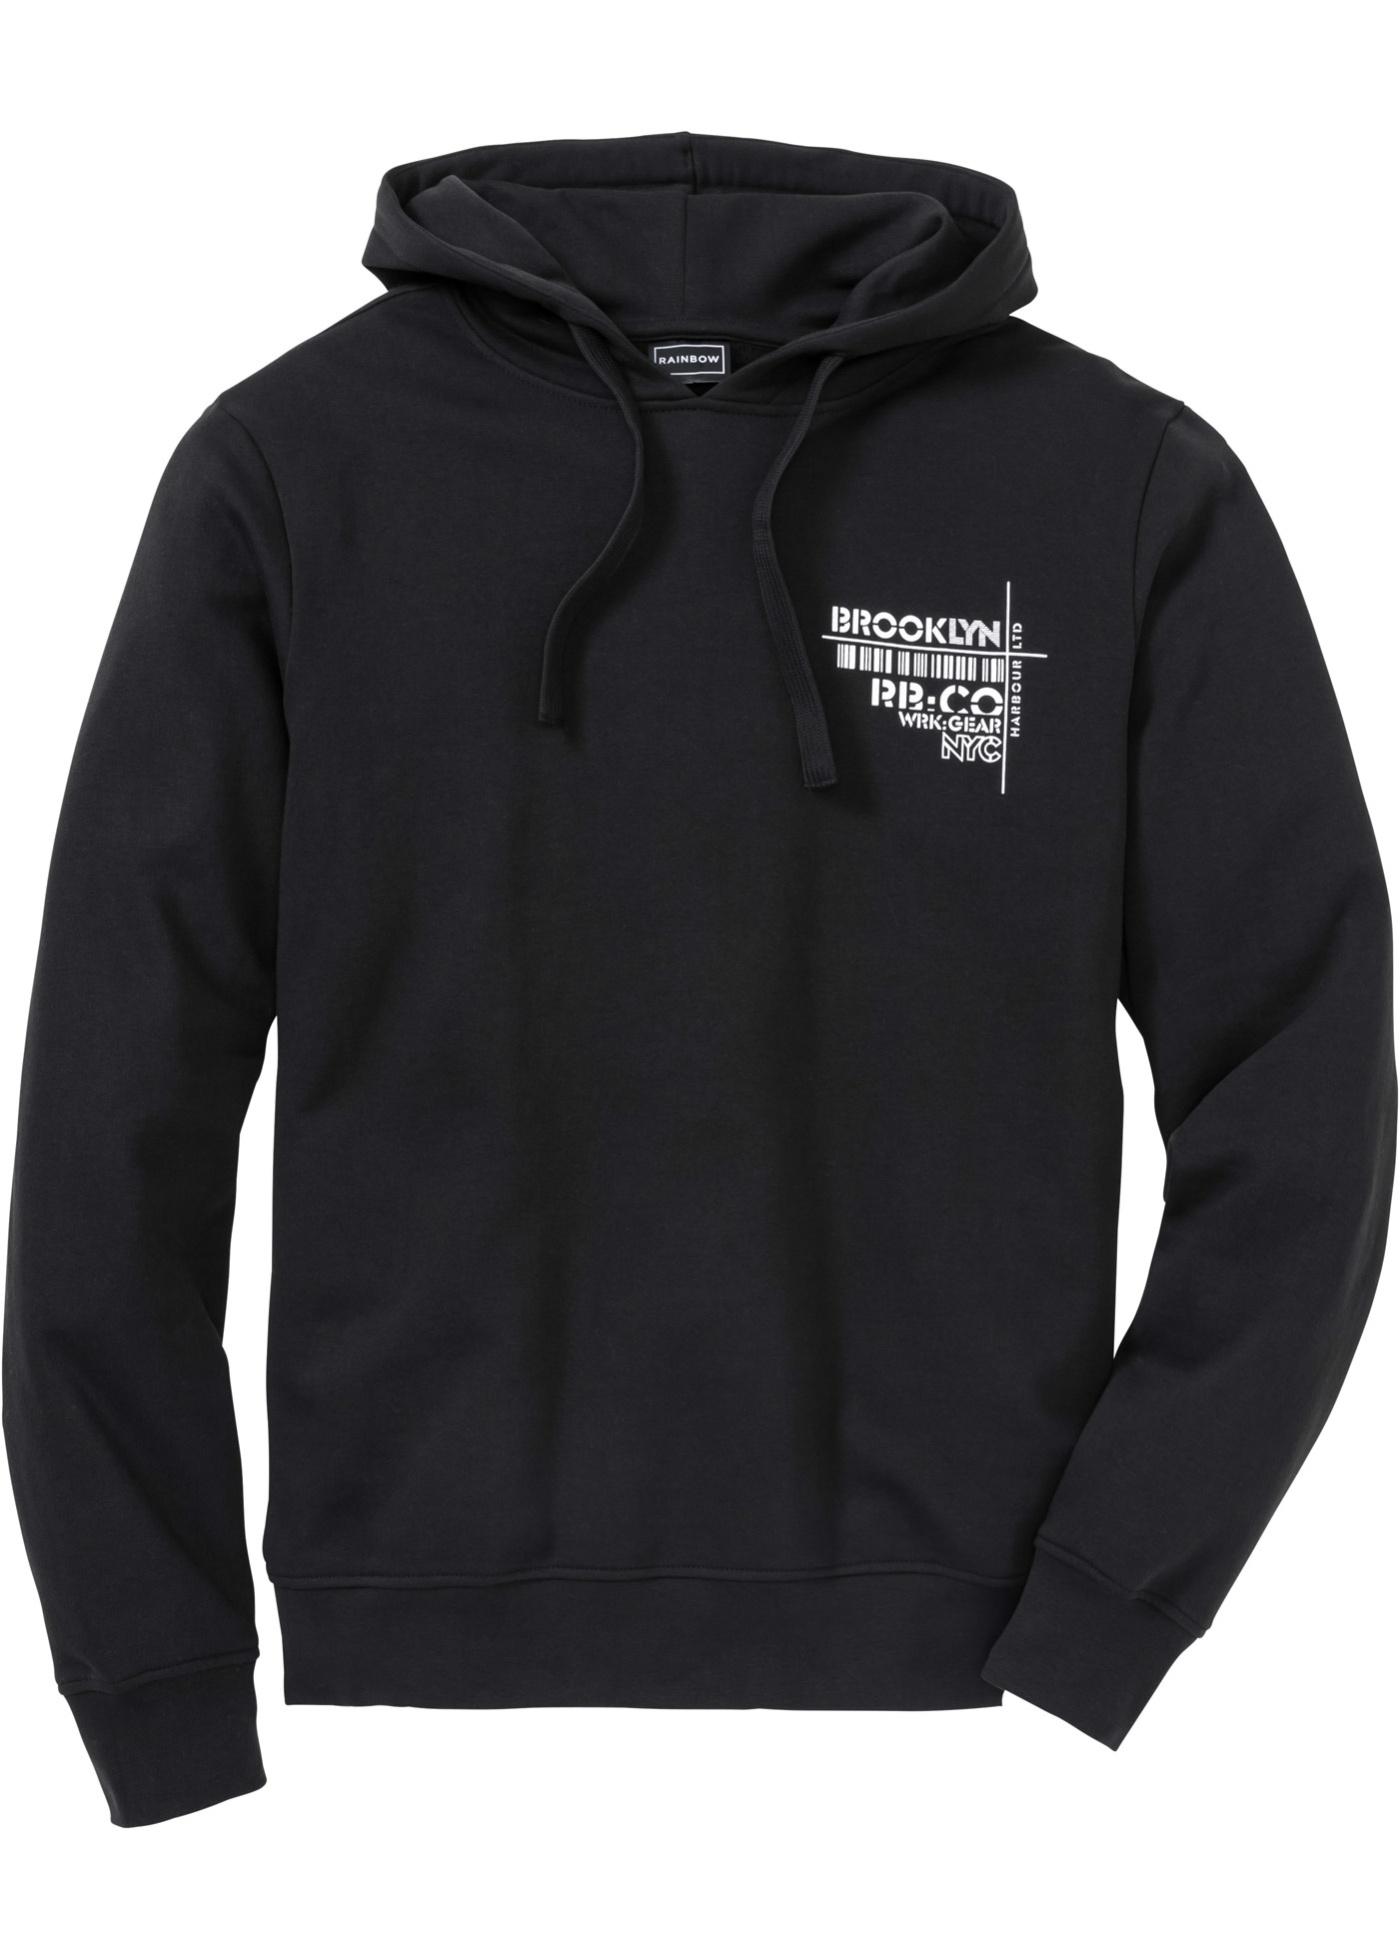 Bonprix SE - Sweatshirt med kapuschong, smal passform 249.00